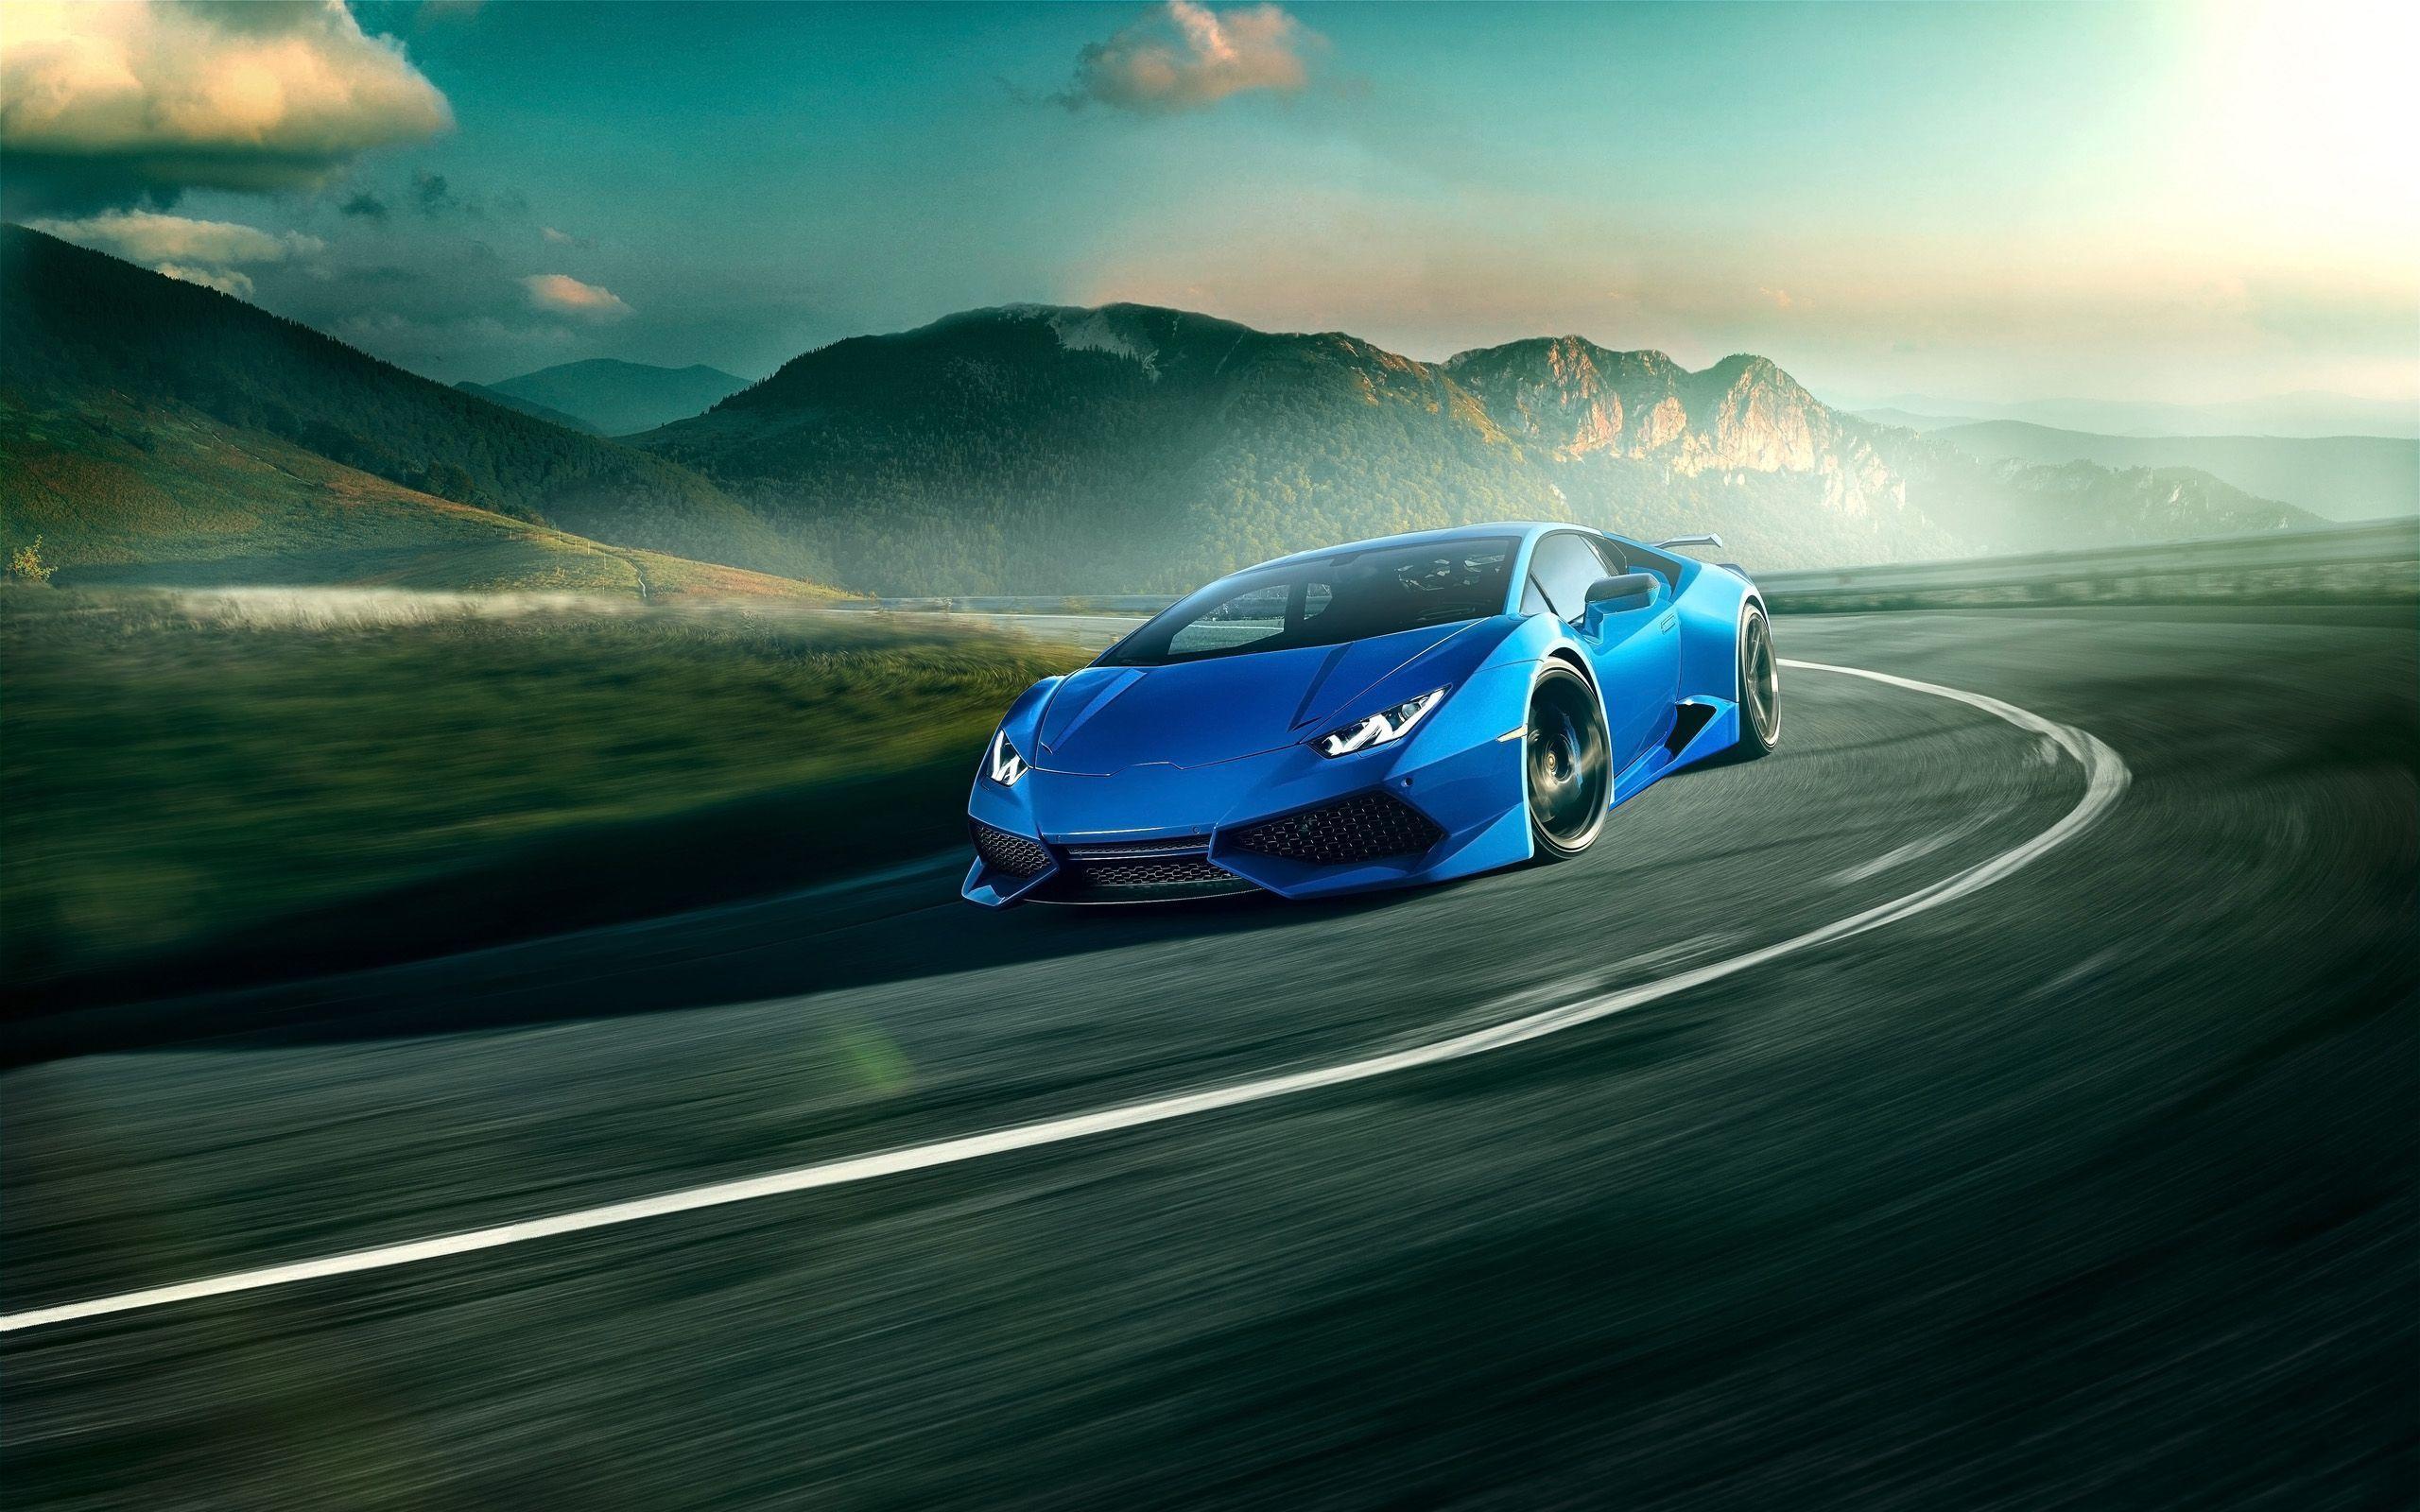 70 Best Free Neon Lamborghini Wallpapers Wallpaperaccess